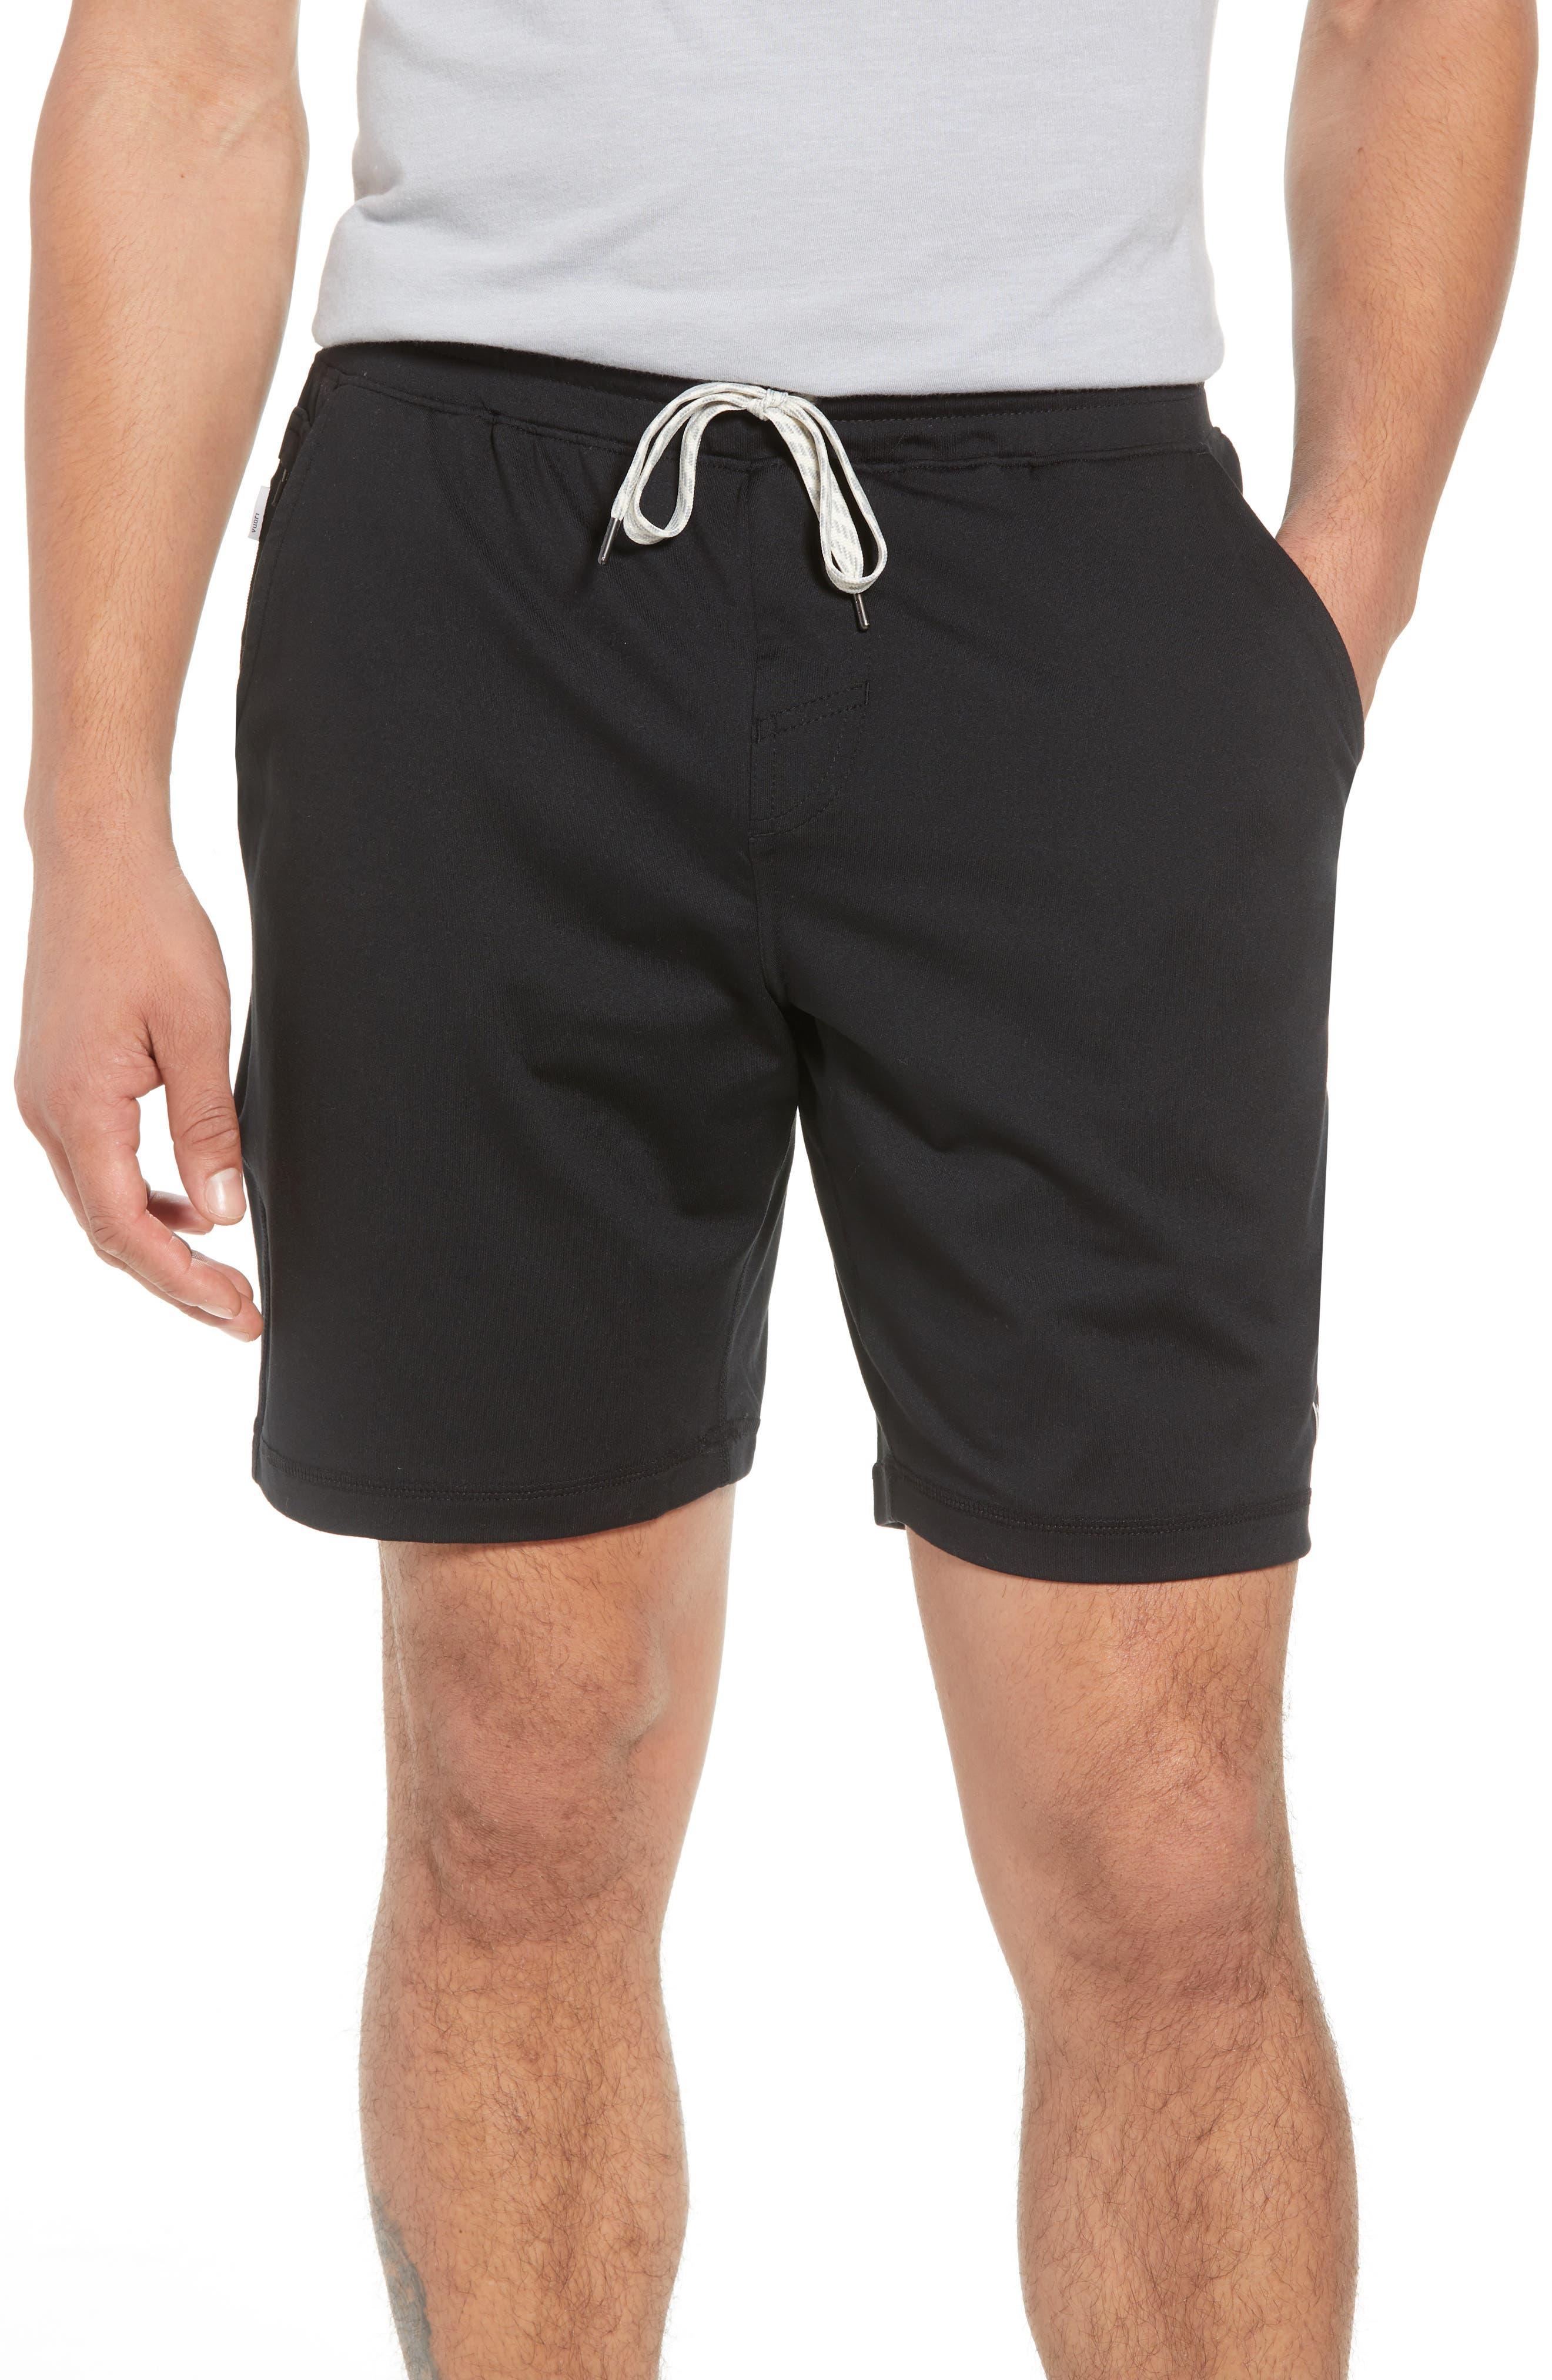 Ponto Shorts,                         Main,                         color, Black